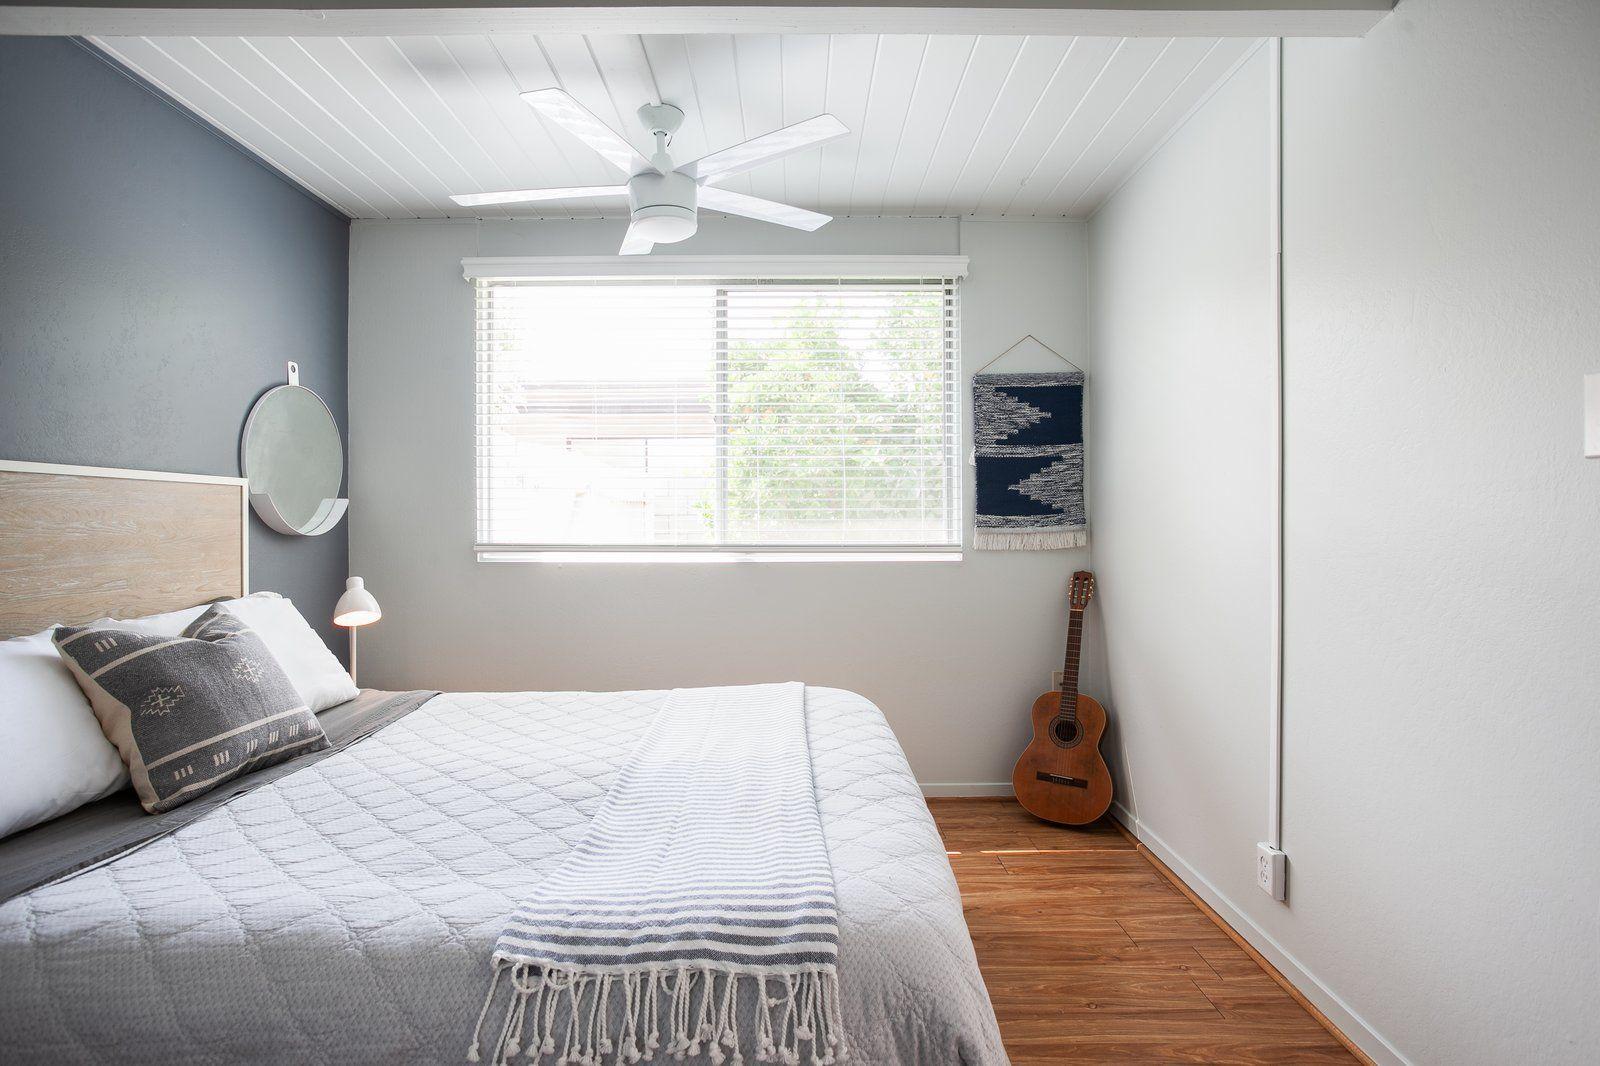 50 Bright Ideas For Bedroom Ceiling Lighting Bedroom Ceiling Fan Light Ceiling Fan Bedroom Light Fixtures Bedroom Ceiling